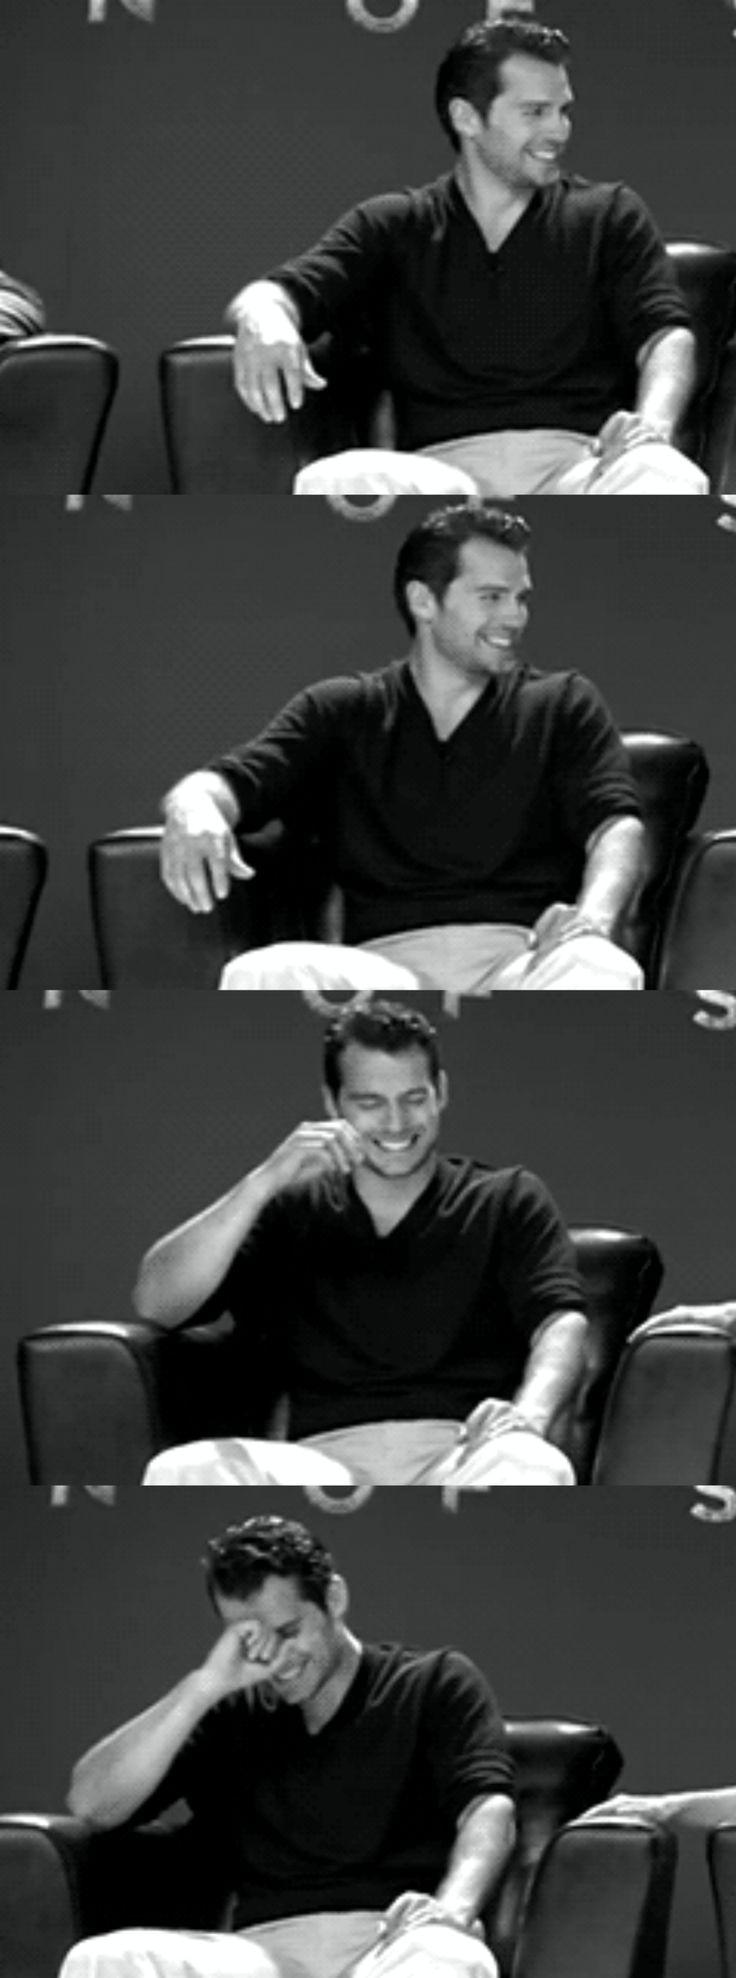 Henry Cavill. Gaaaaahhhhh!!! Love that smile!!!